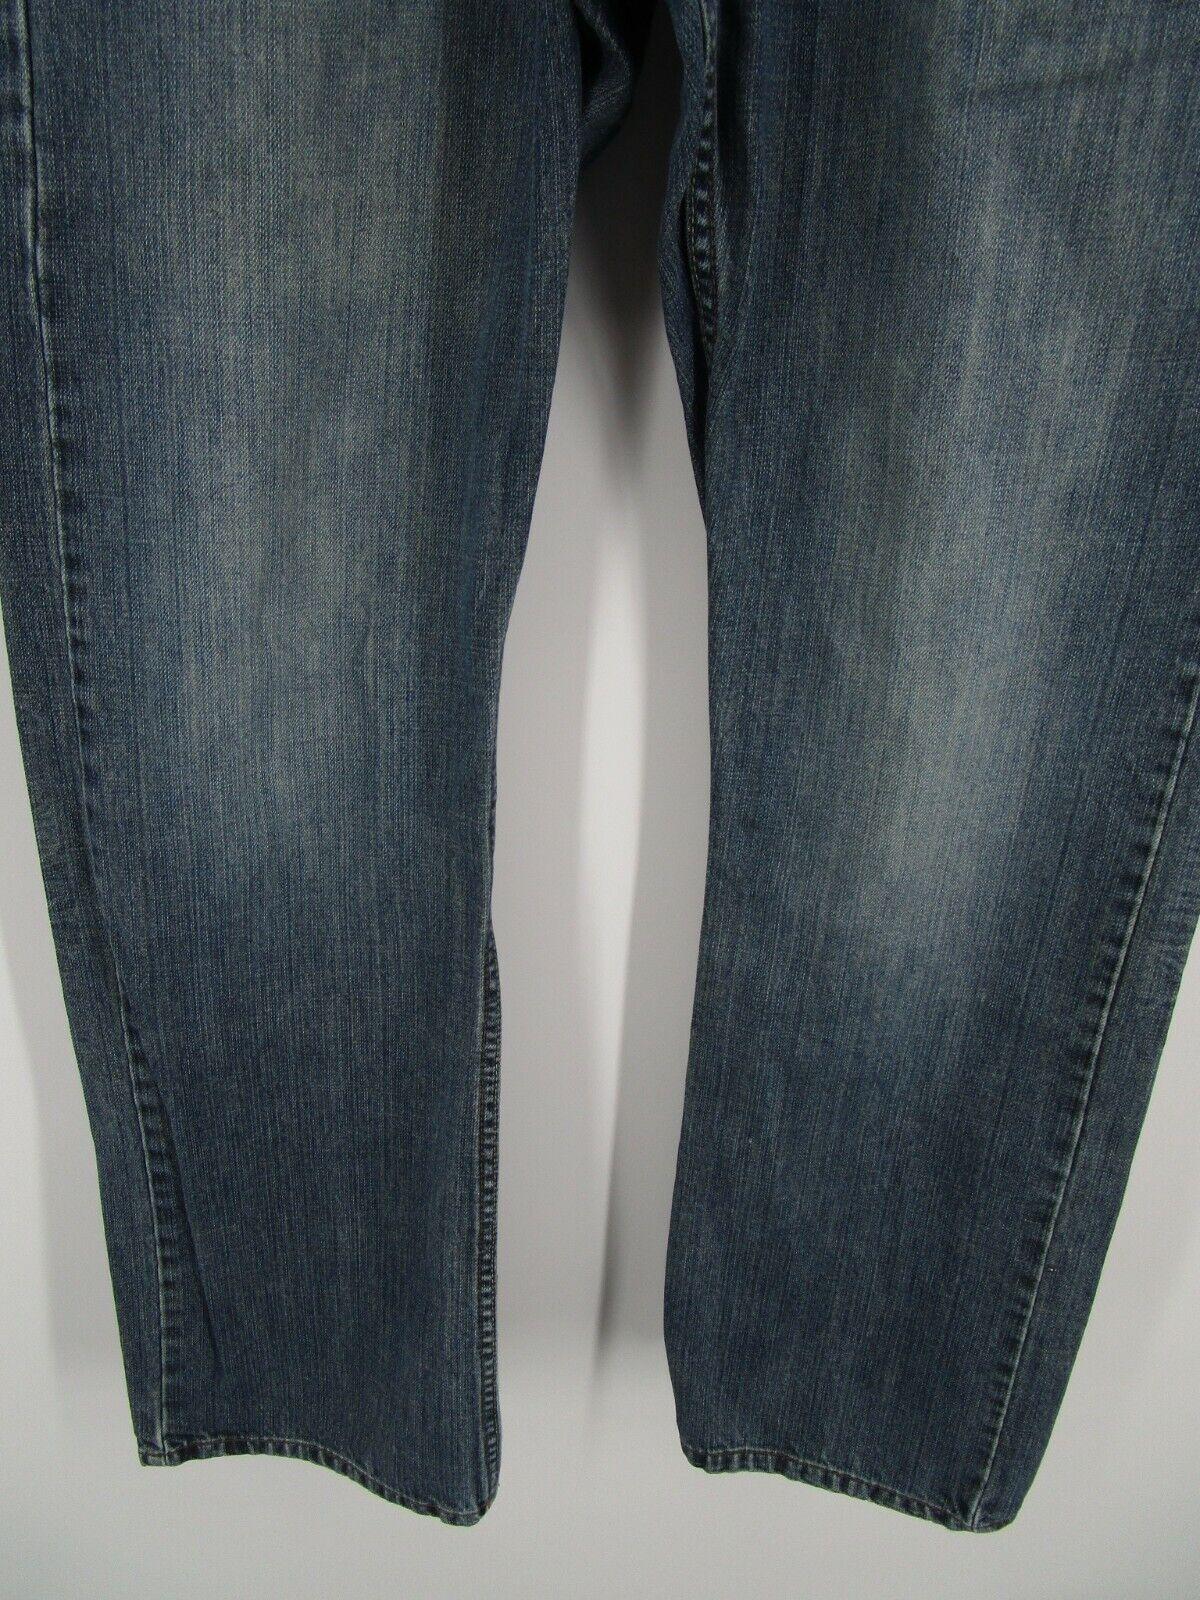 Lee Dungarees Men Size 31X32 Retro Y2K Blue Relax… - image 3